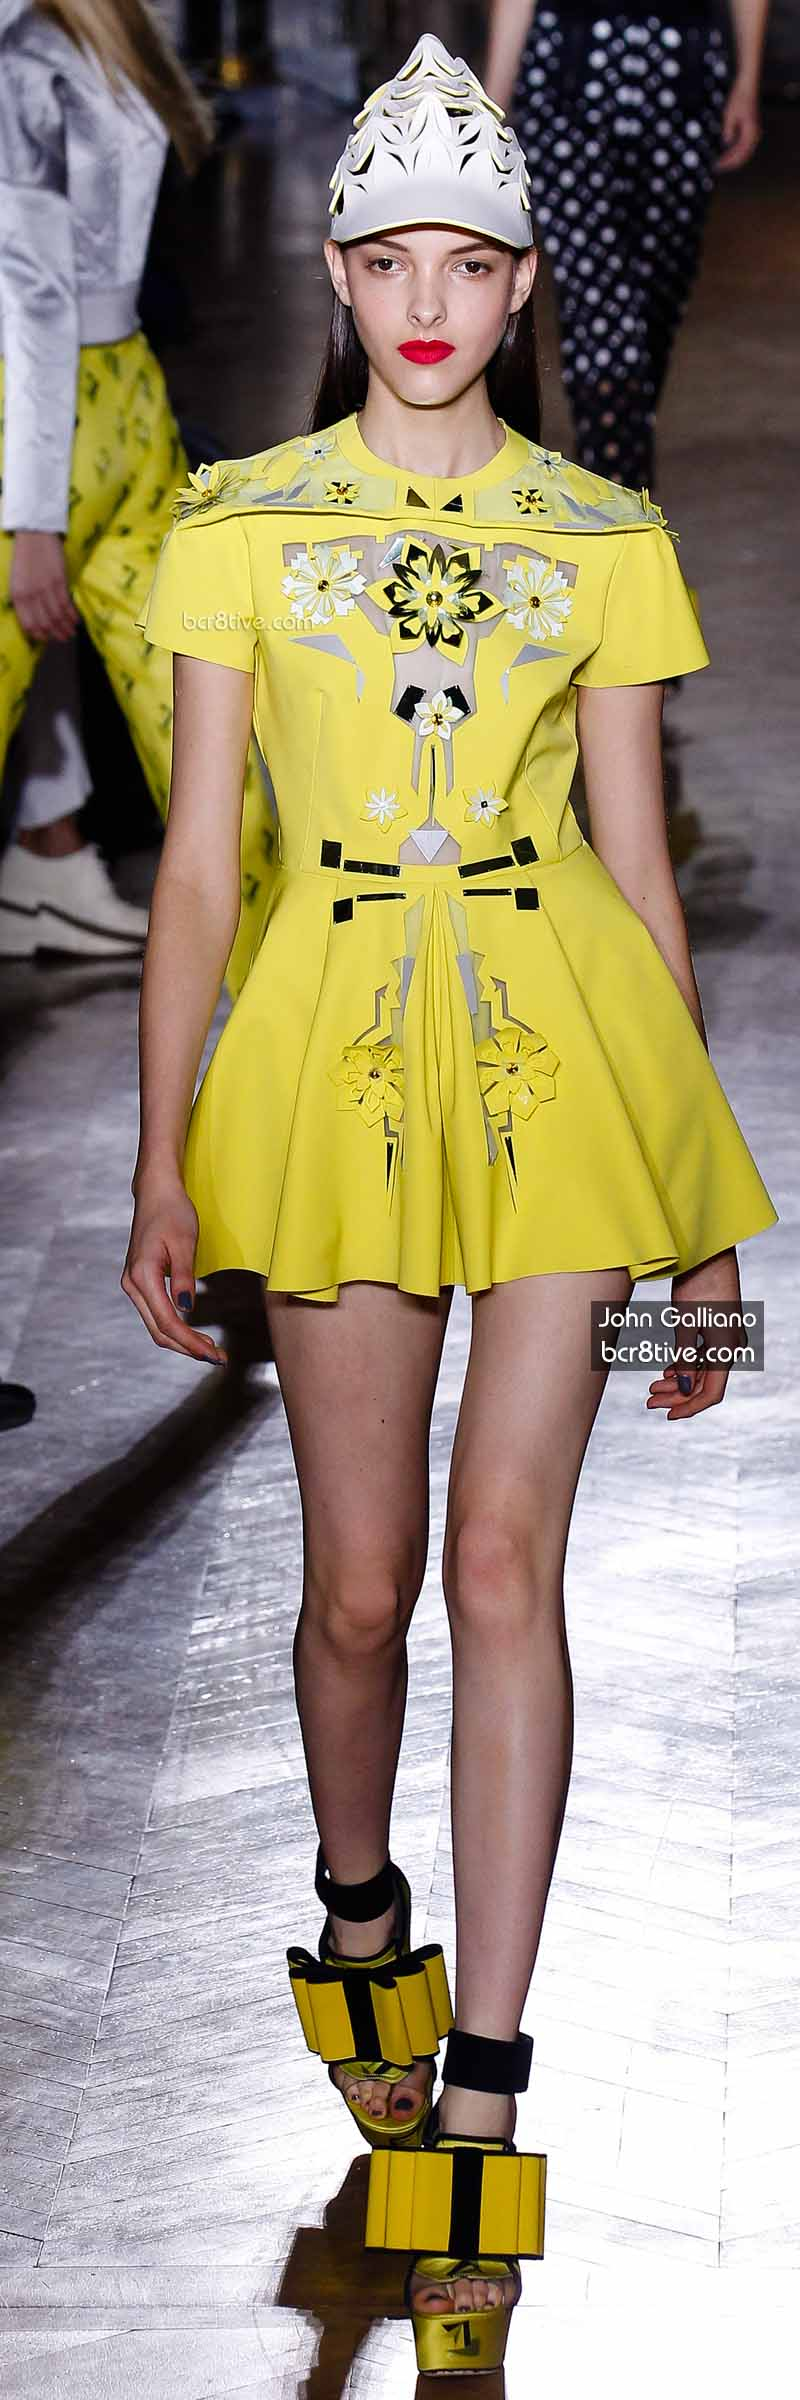 John Galliano - Mini Yellow Dress